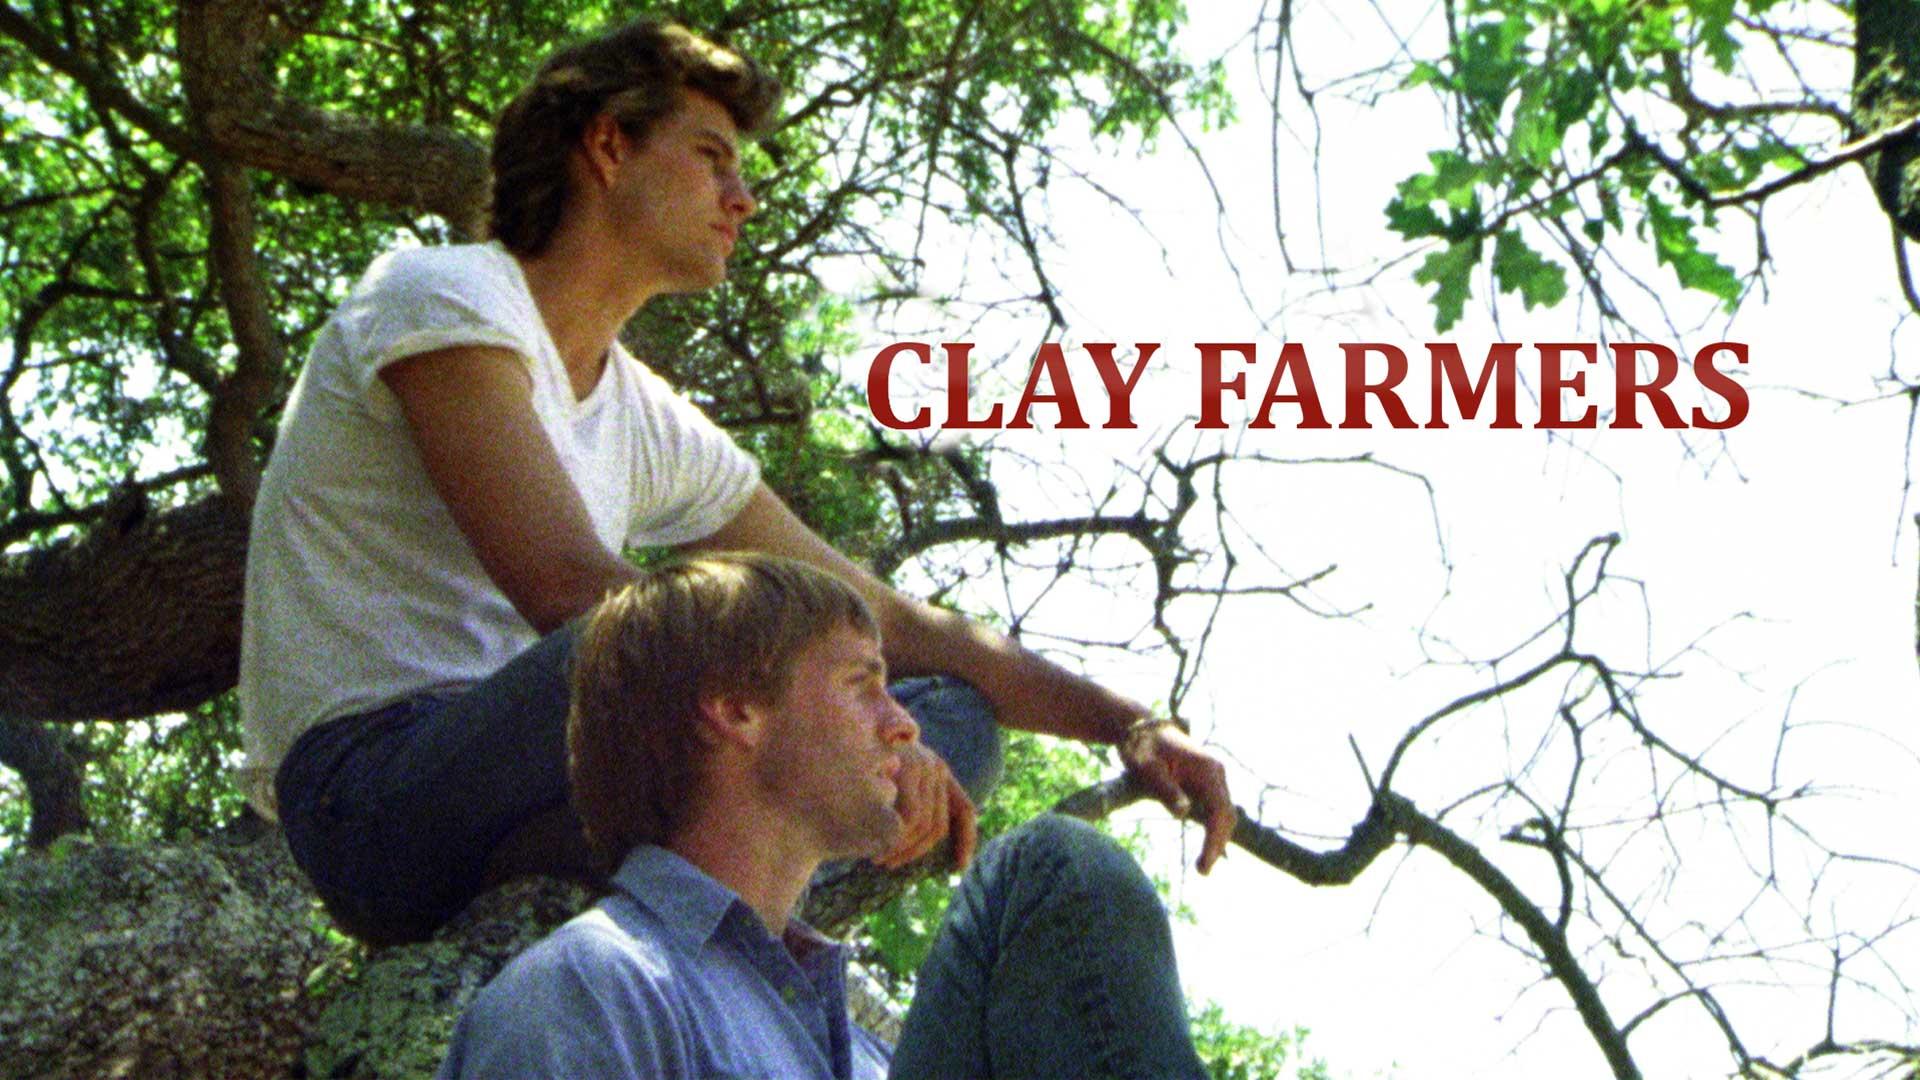 Clay Farmers